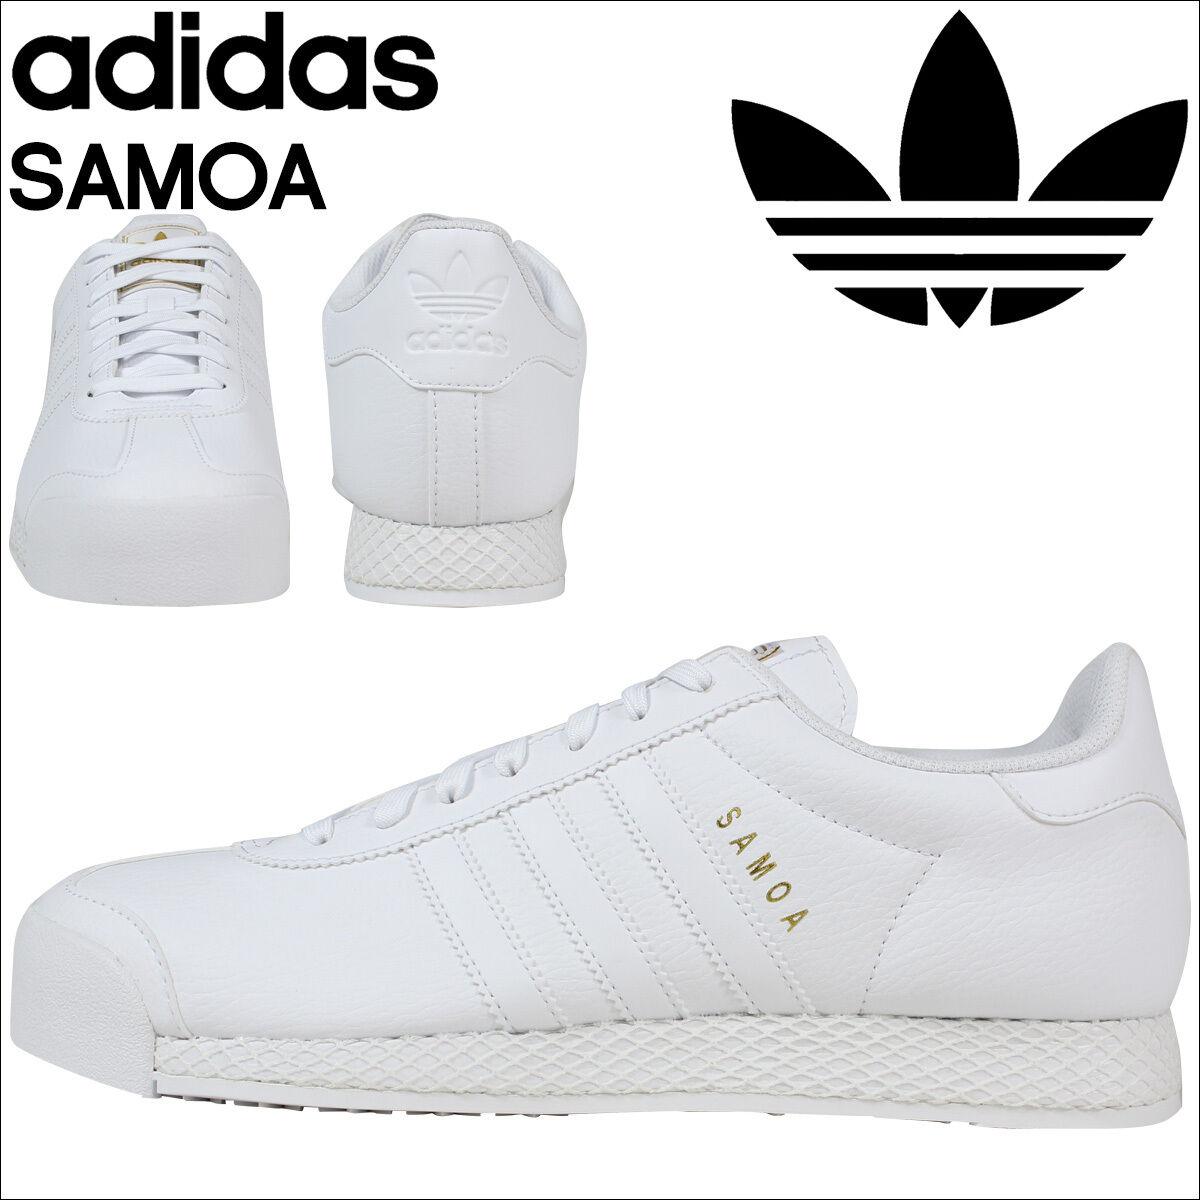 Adidas Originals SAMOA Retro White  Uomo Trainers F37599 NEW